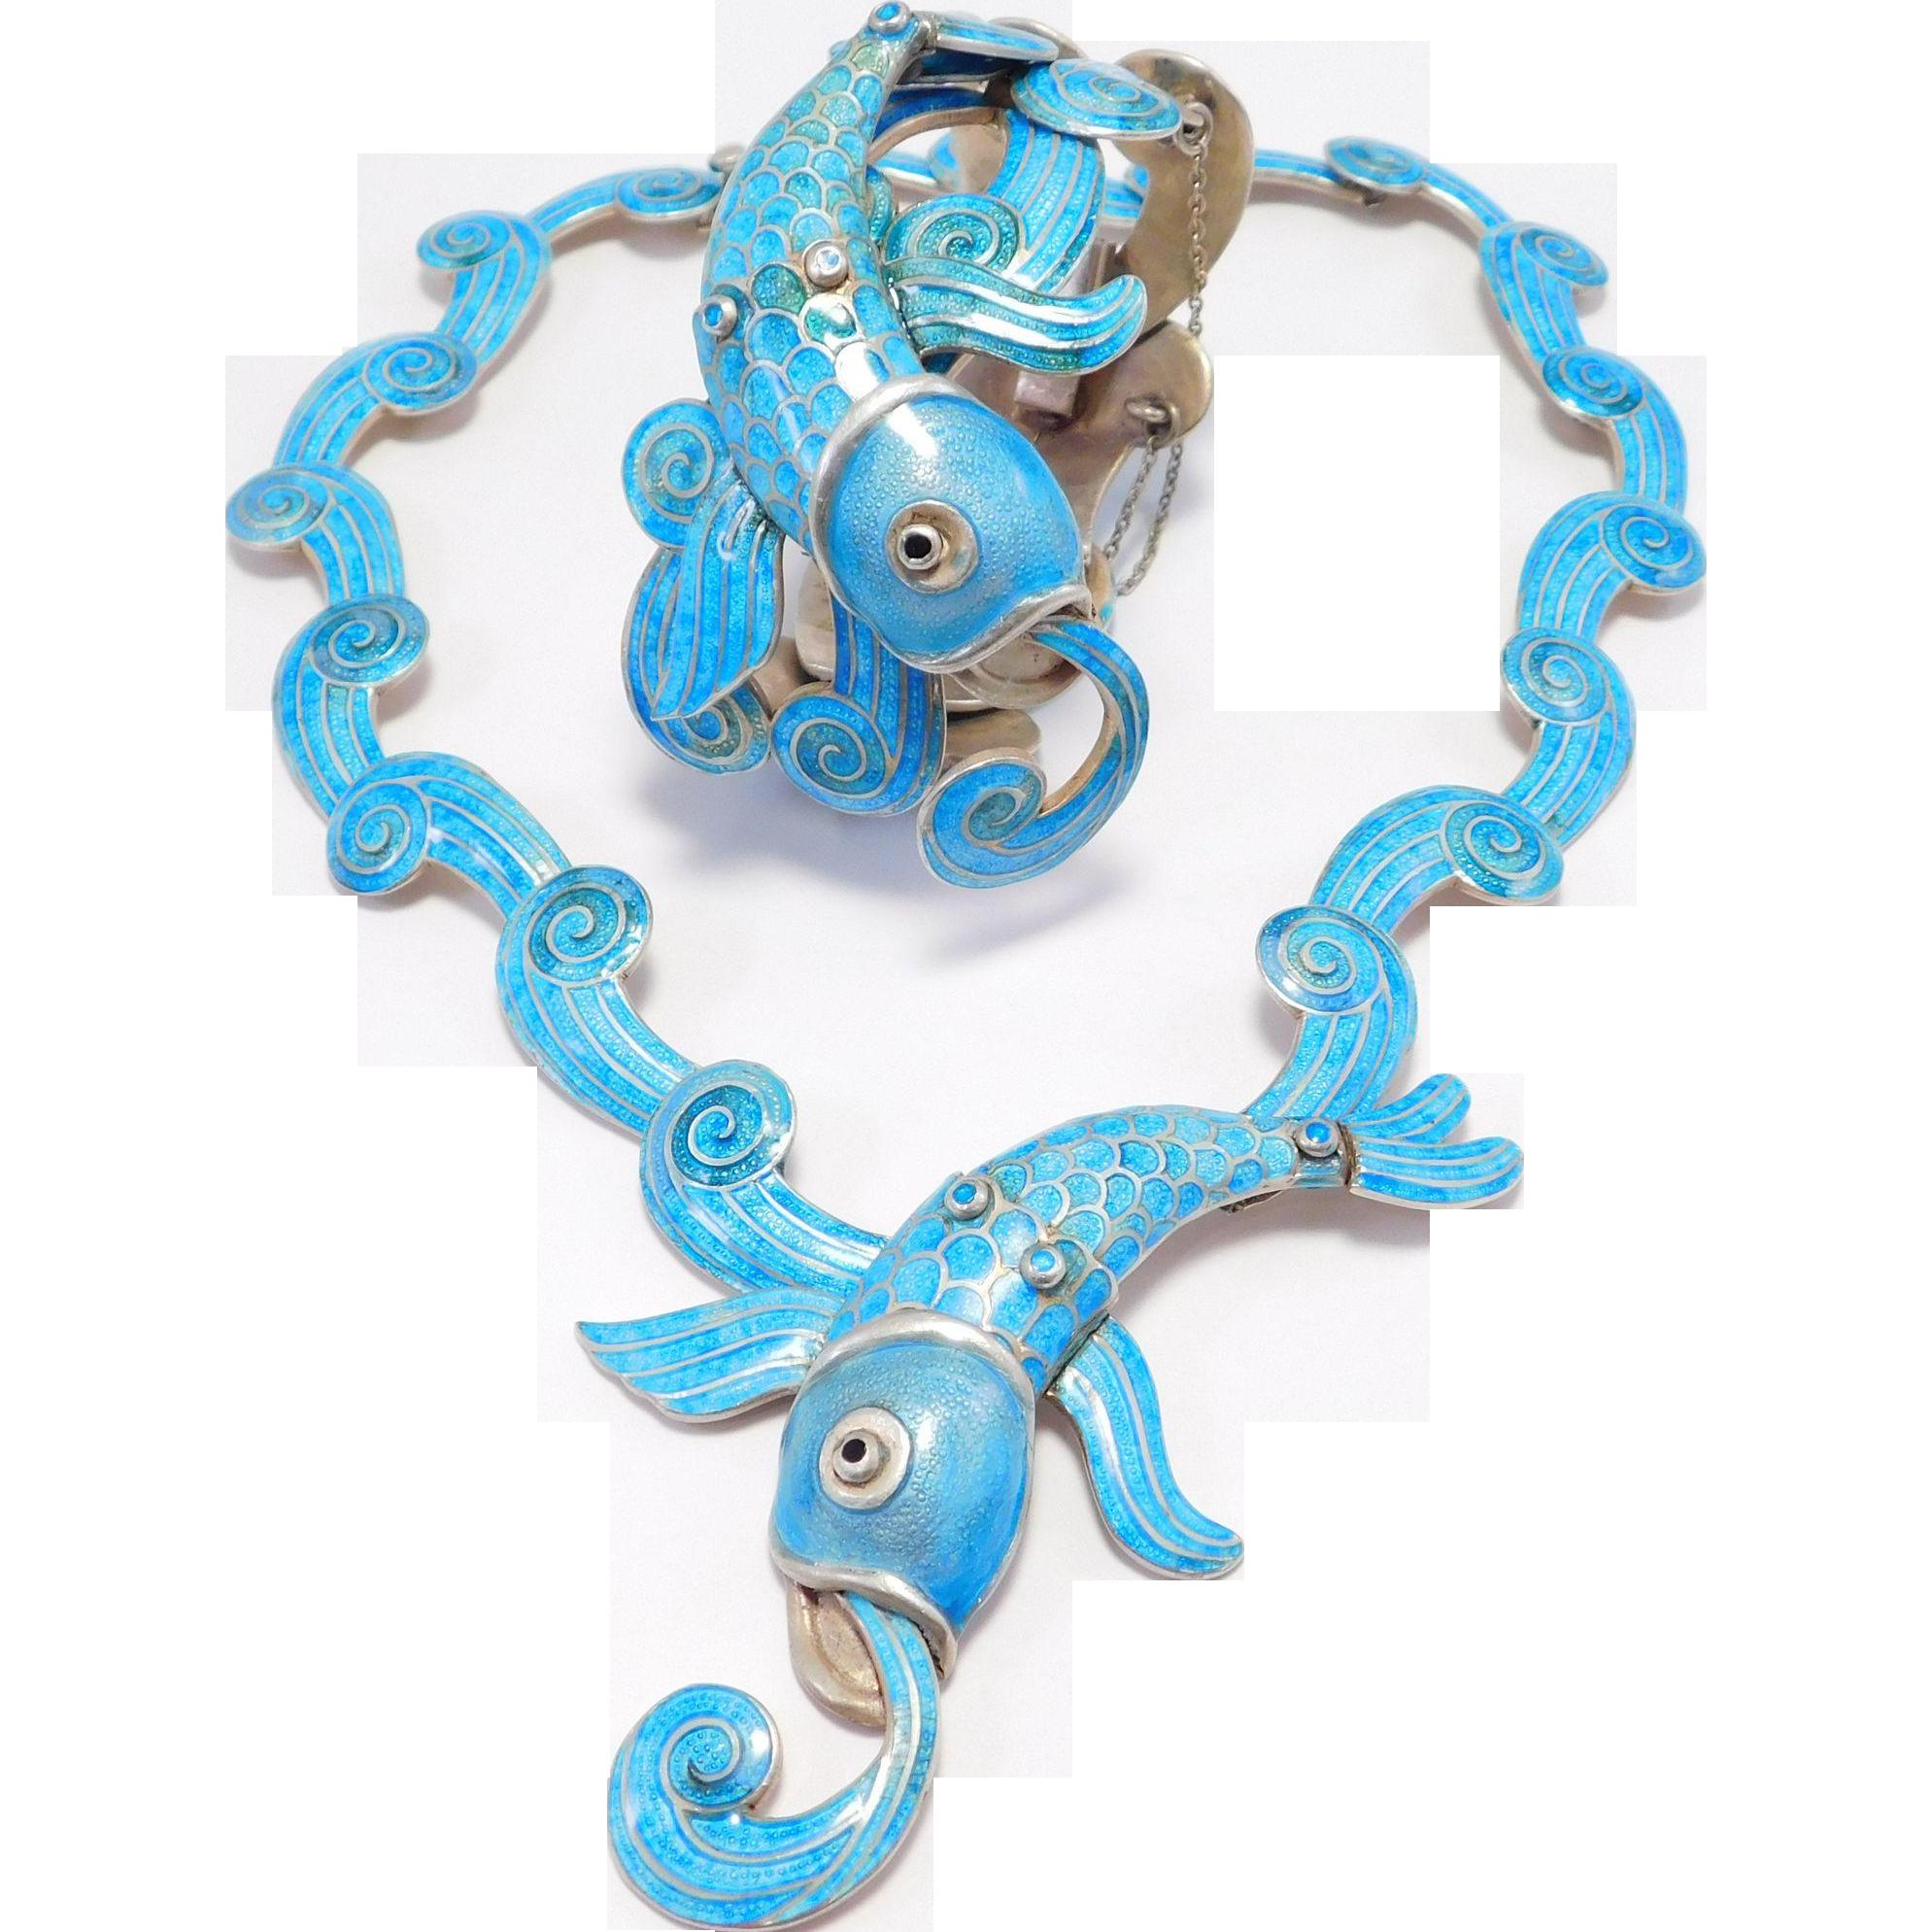 Rare Margot De Taxco Enamel Dolphin Fish Necklace & Bracelet Set